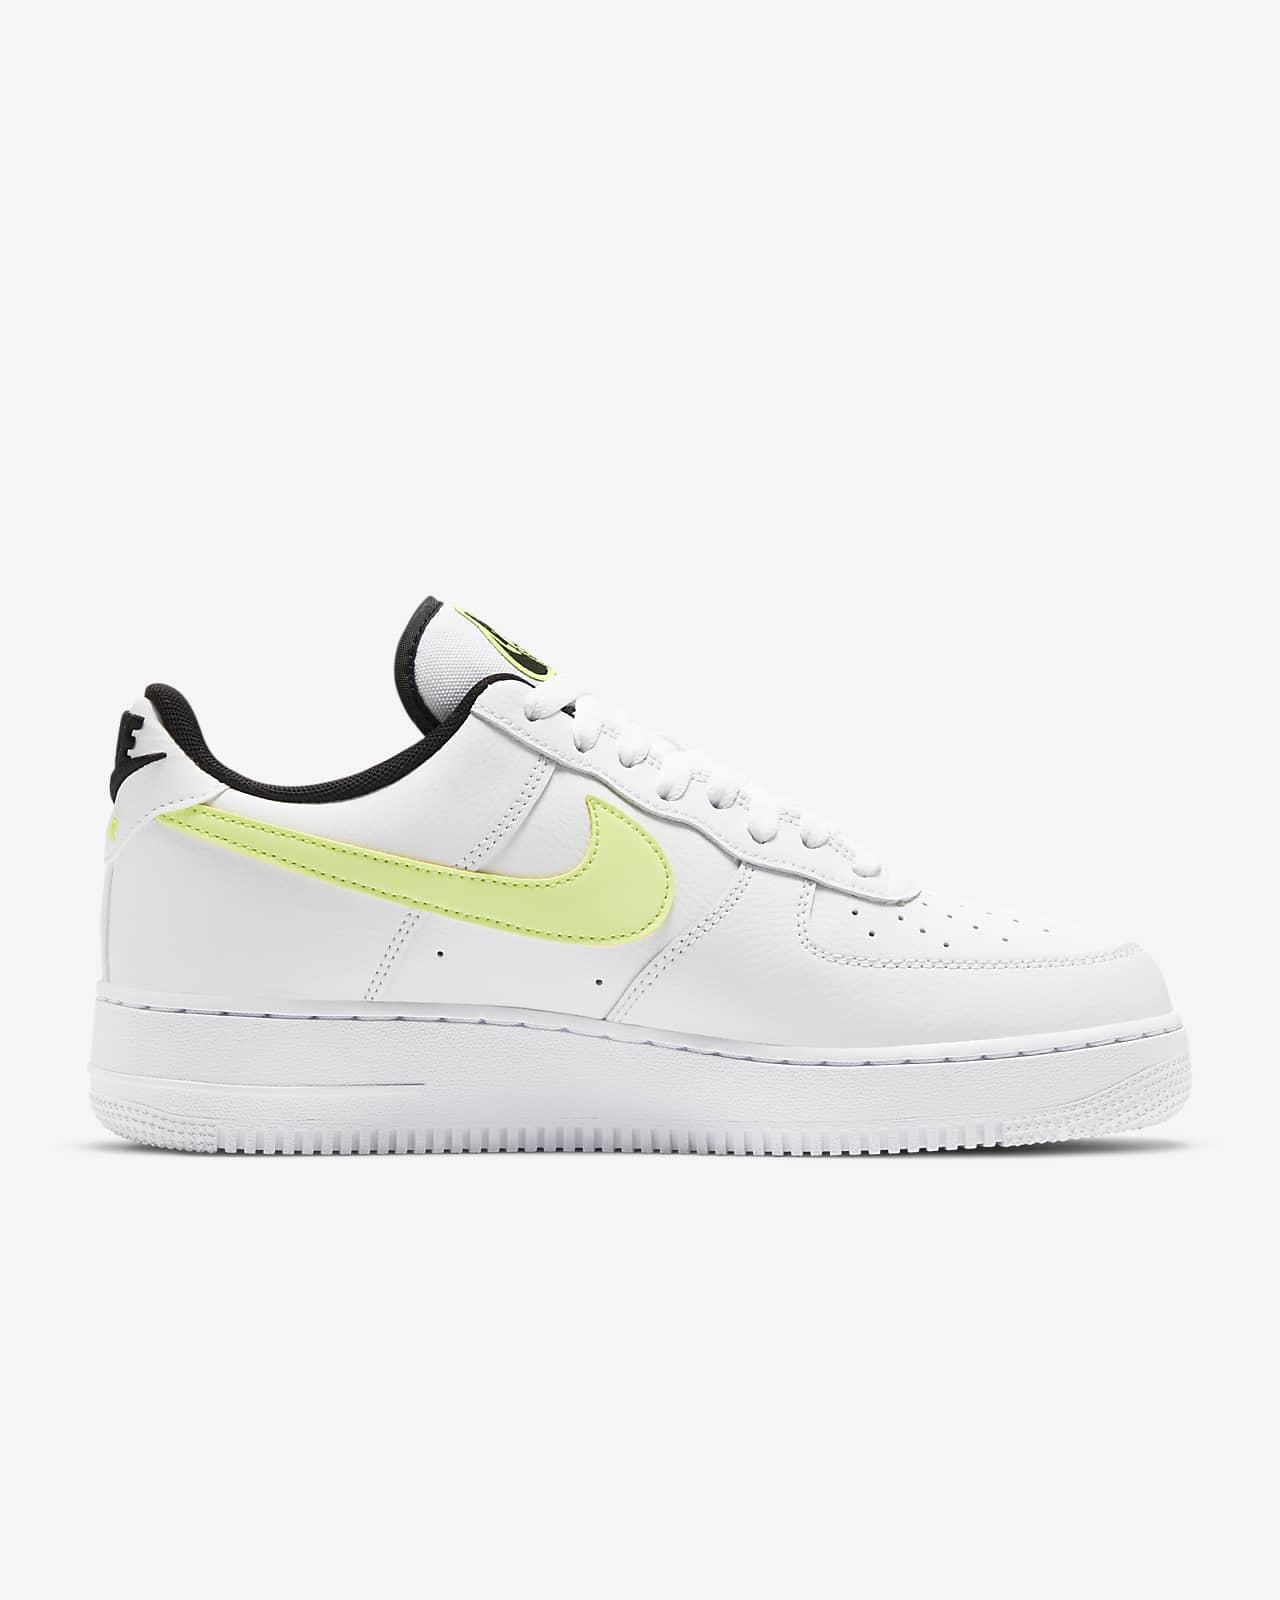 Nike Air Force 1 '07 LV8 WW Men's Shoe